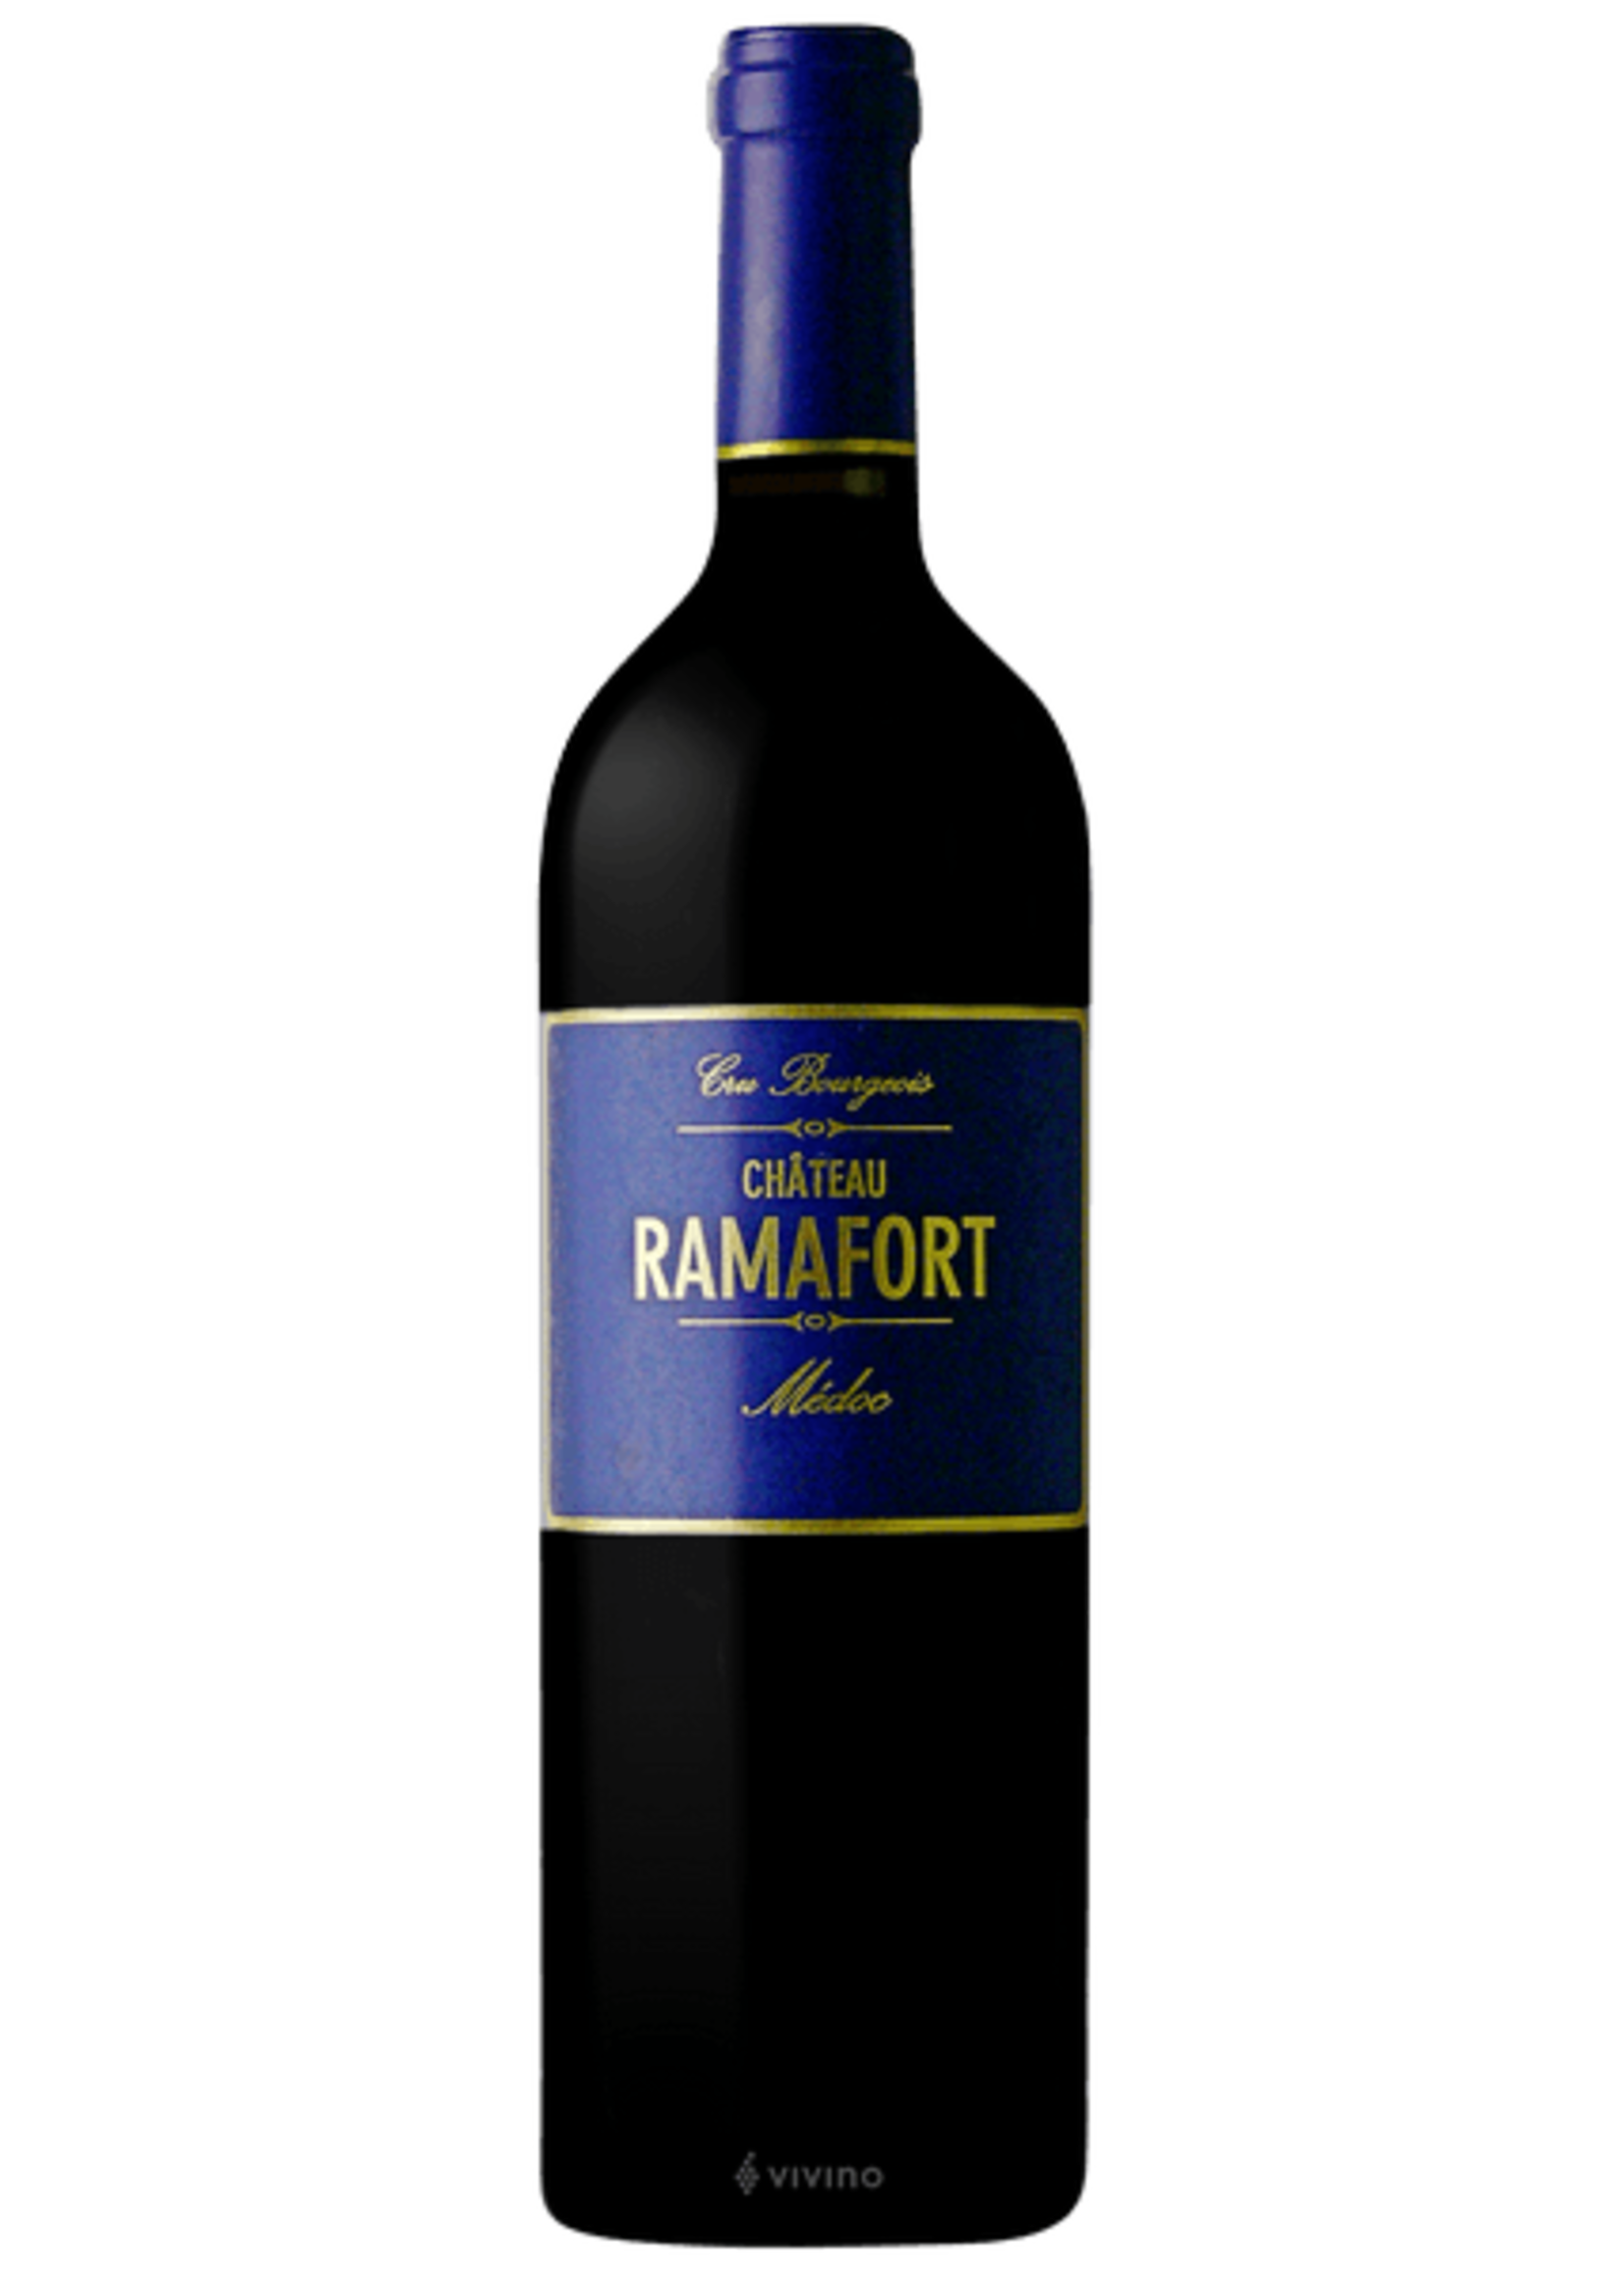 Chateau Ramafort Chateau Ramafort / Medoc 2016 / 750mL